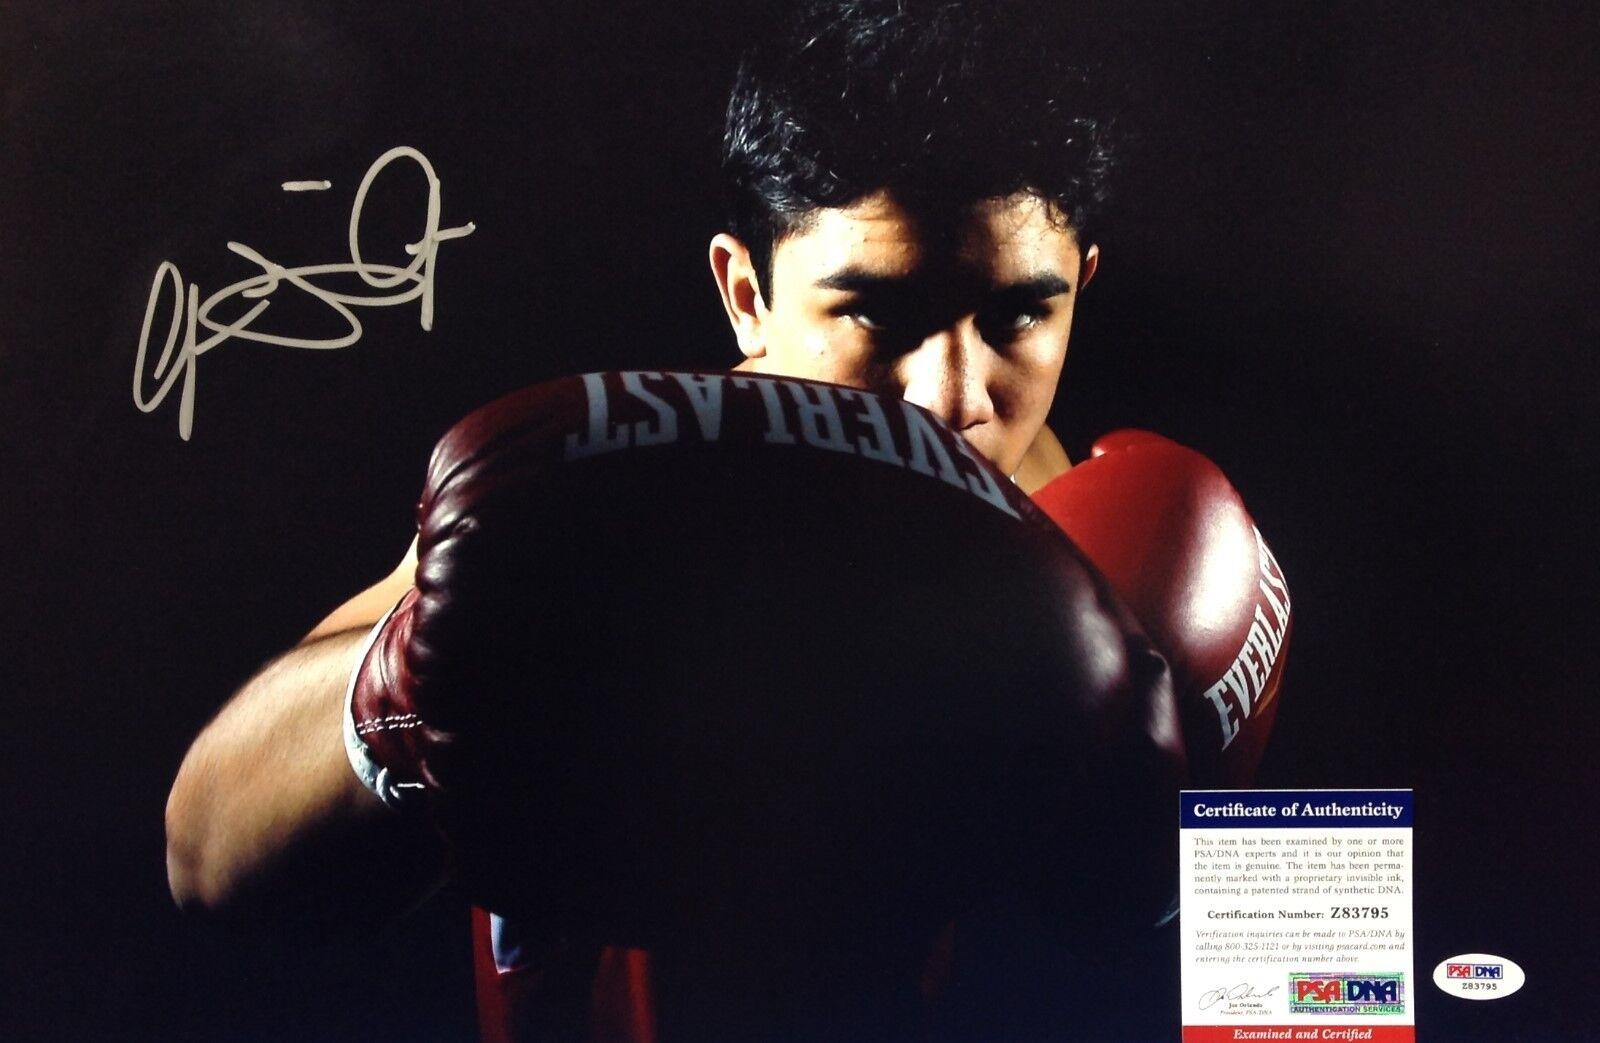 Joseph Daiz Jr. Signed 12x18 Photo - PSA/DNA # Z83795